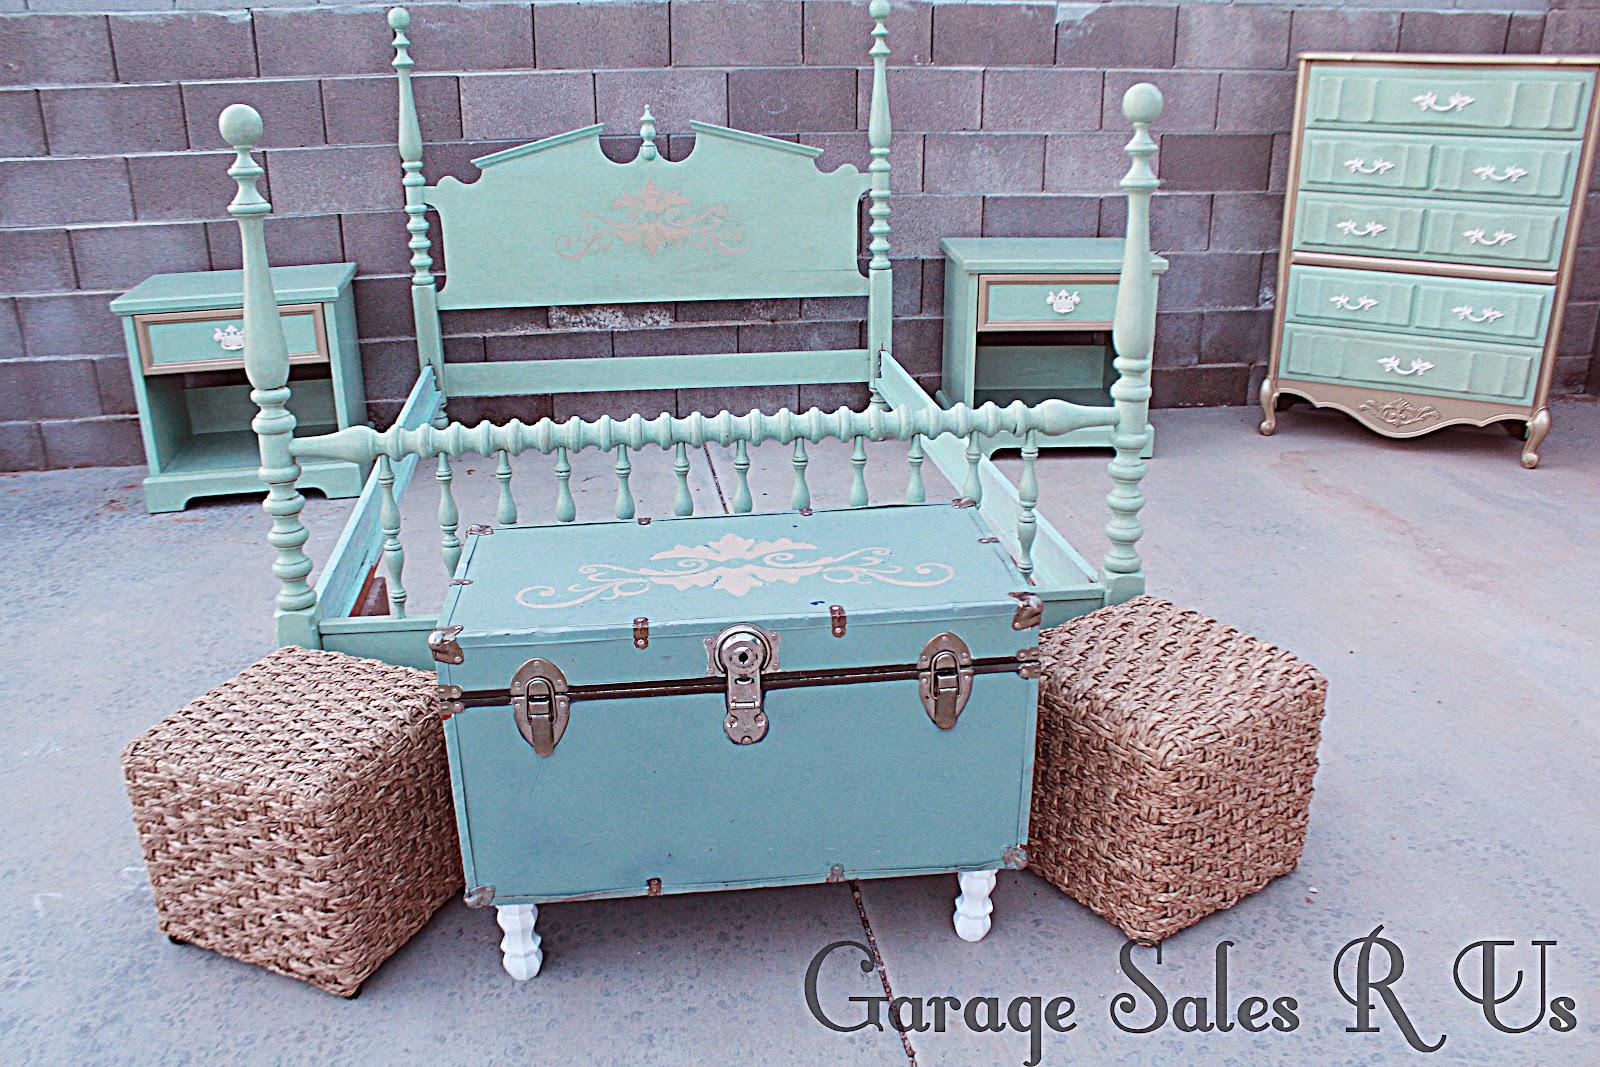 Sales Bedroom Furniture Garage Sales R Us Mint And Gold Full Sized Bedroom Set